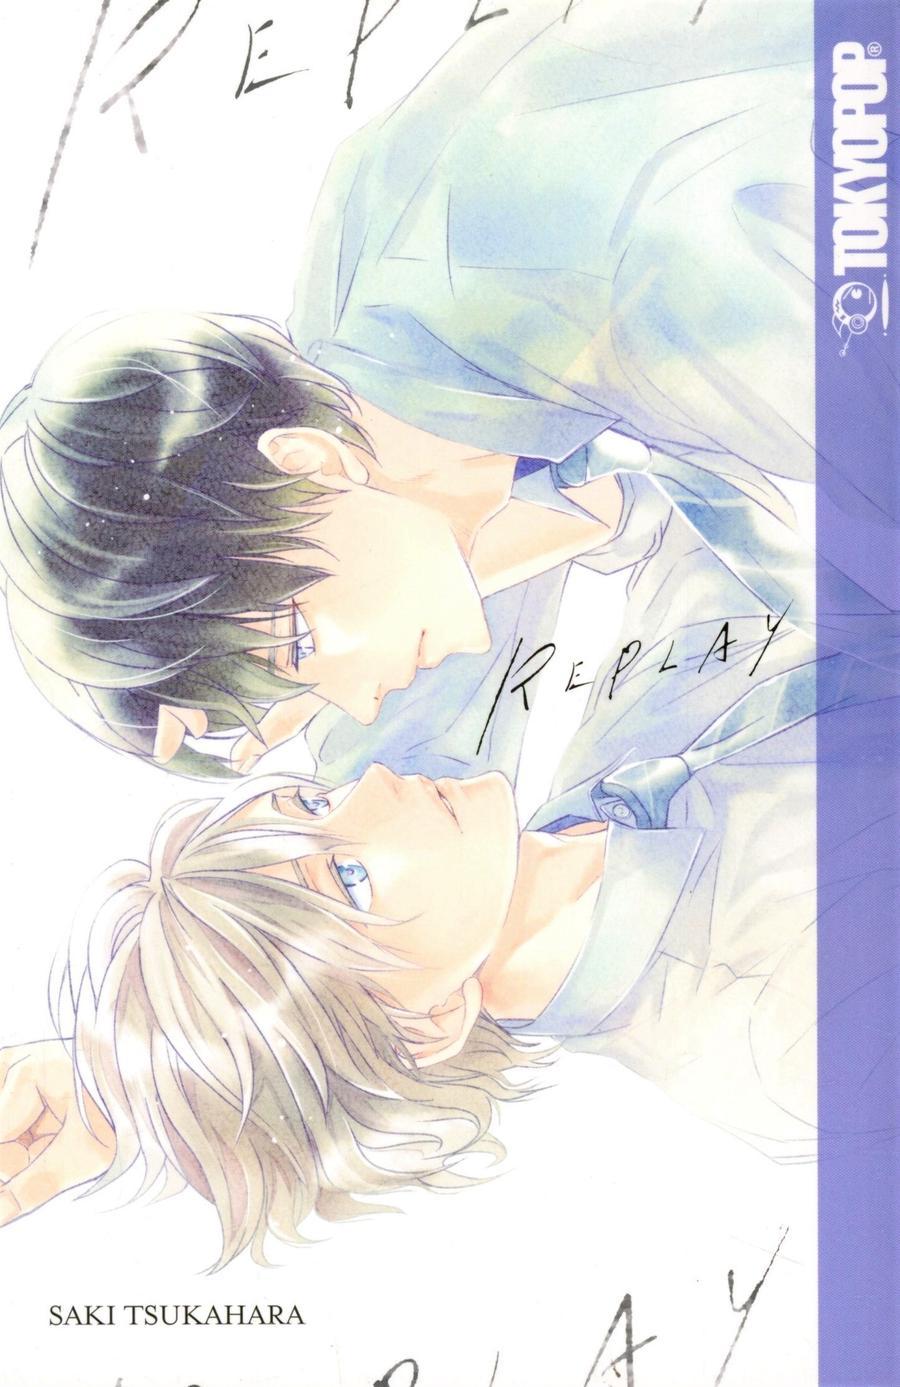 Replay (Yaoi) Vol 1 GN